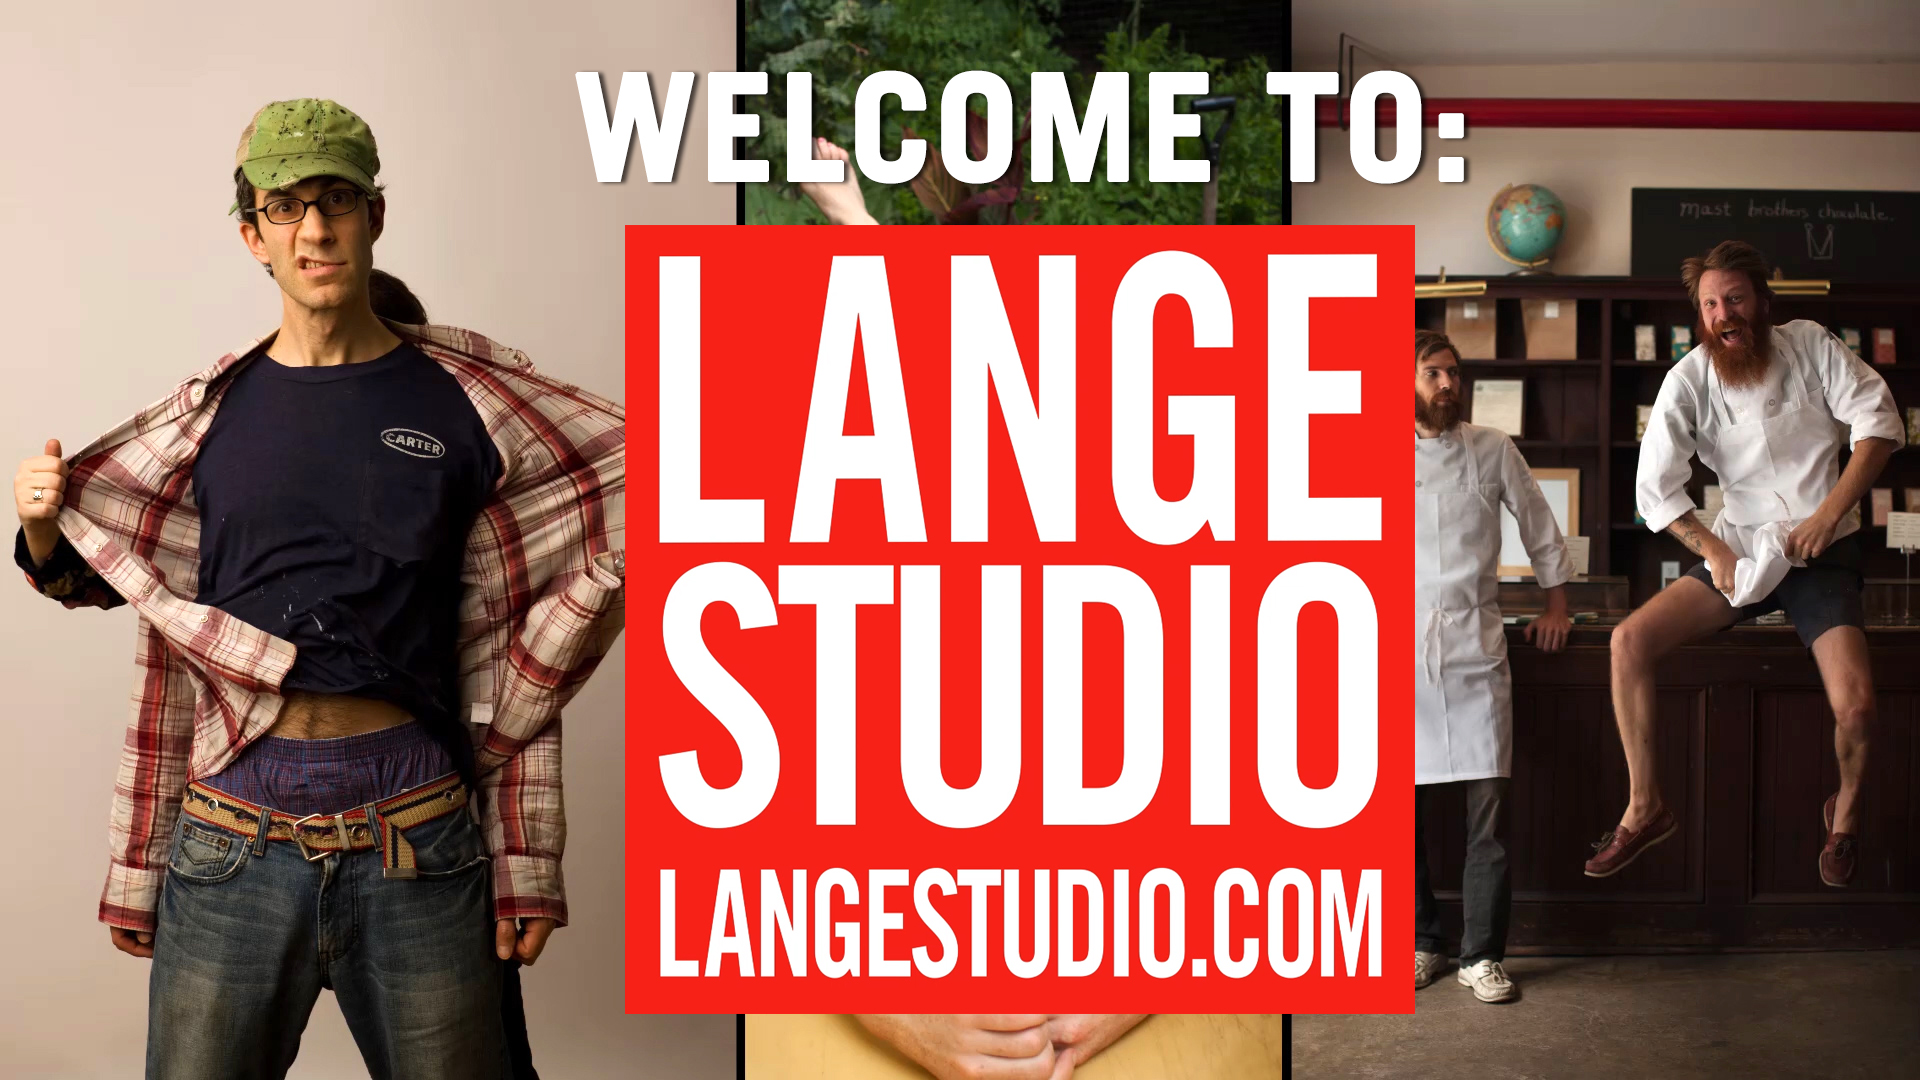 WebThumbnail_Lange_IntroducingLangeStudio_Color.jpg